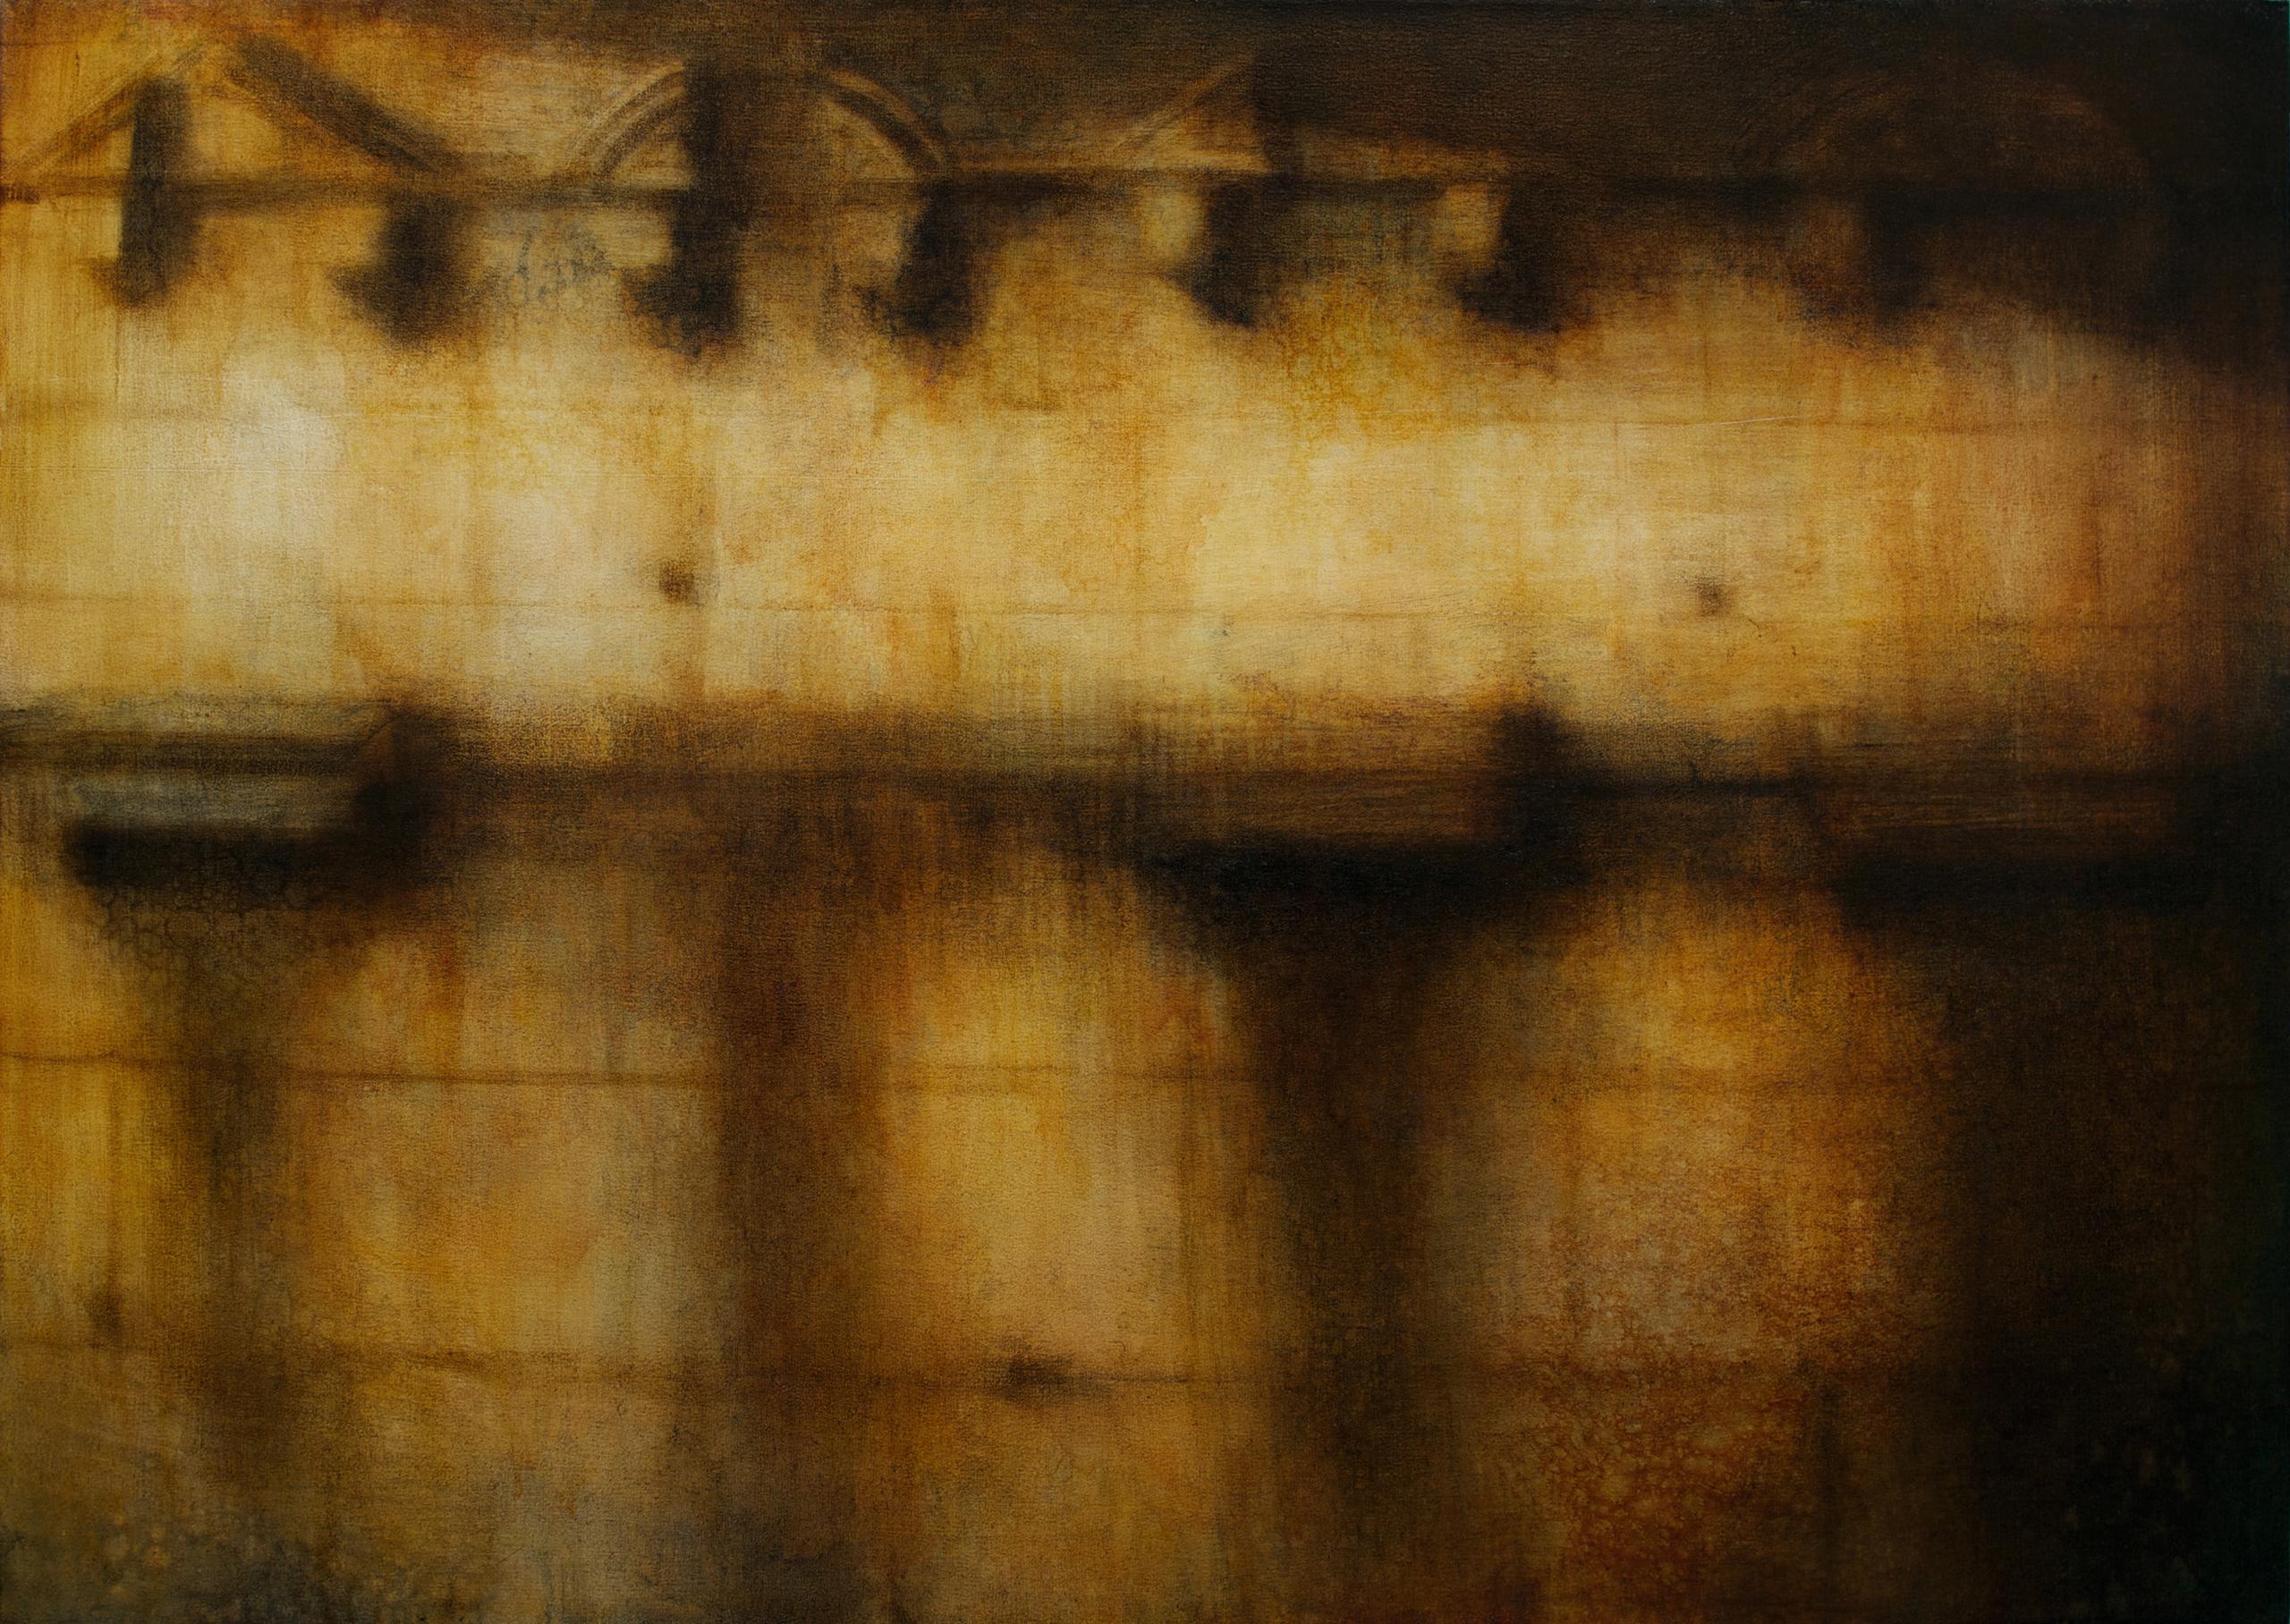 "Maya Kulenovic: VENERATION 2015-16, oil on canvas, 41"" x 57"" (104cm x 145cm). 'Build' Series. (Architecture)"